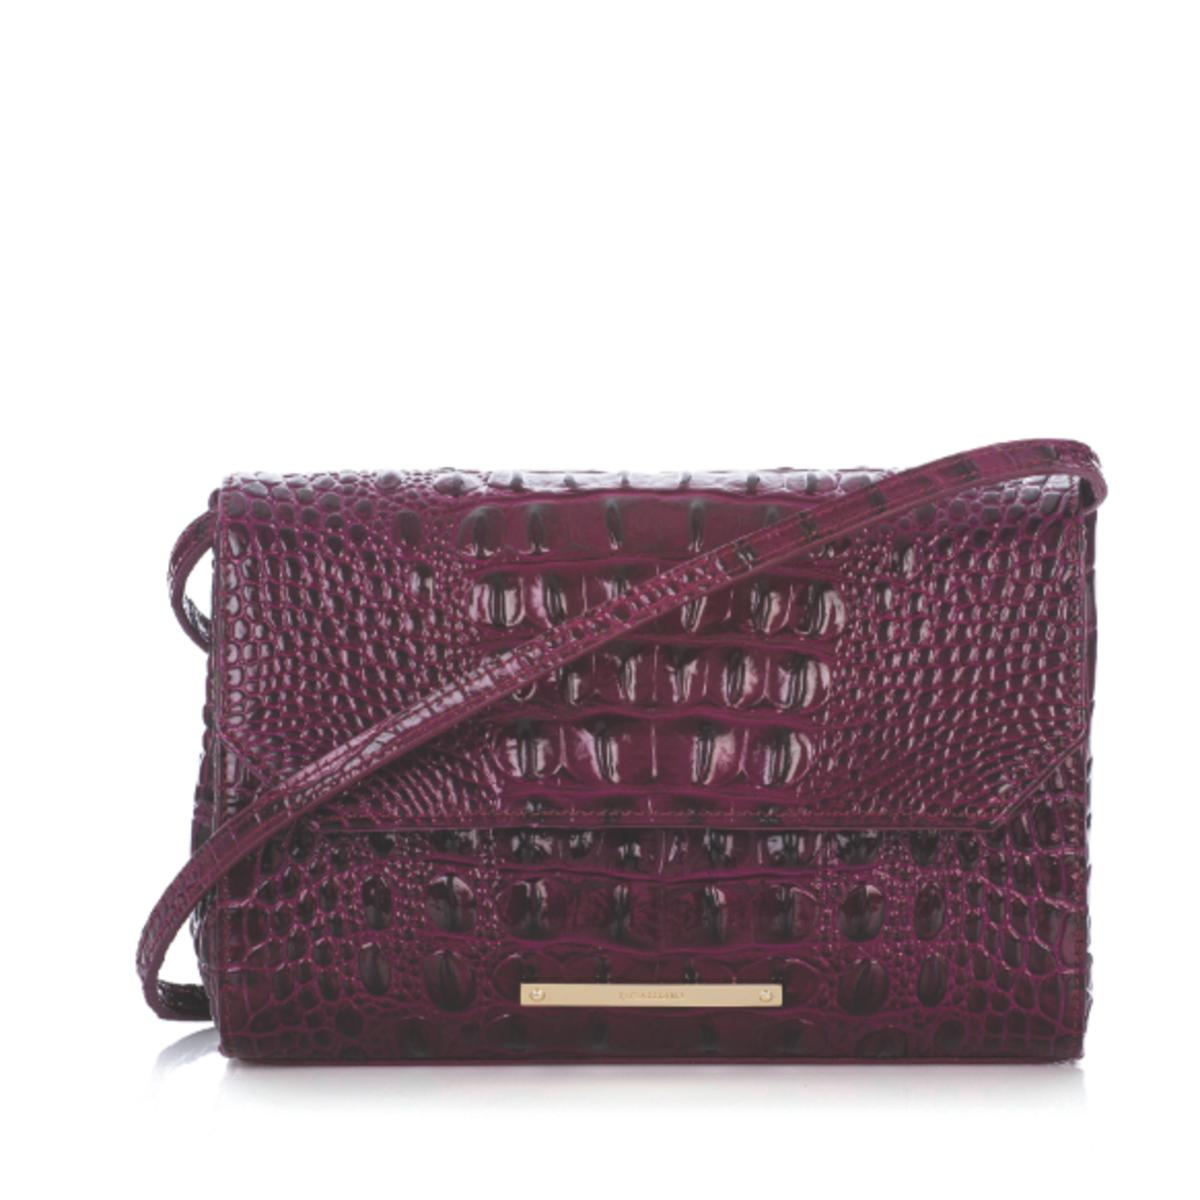 Brahmin Black Cherry Melbourne Carina handbag